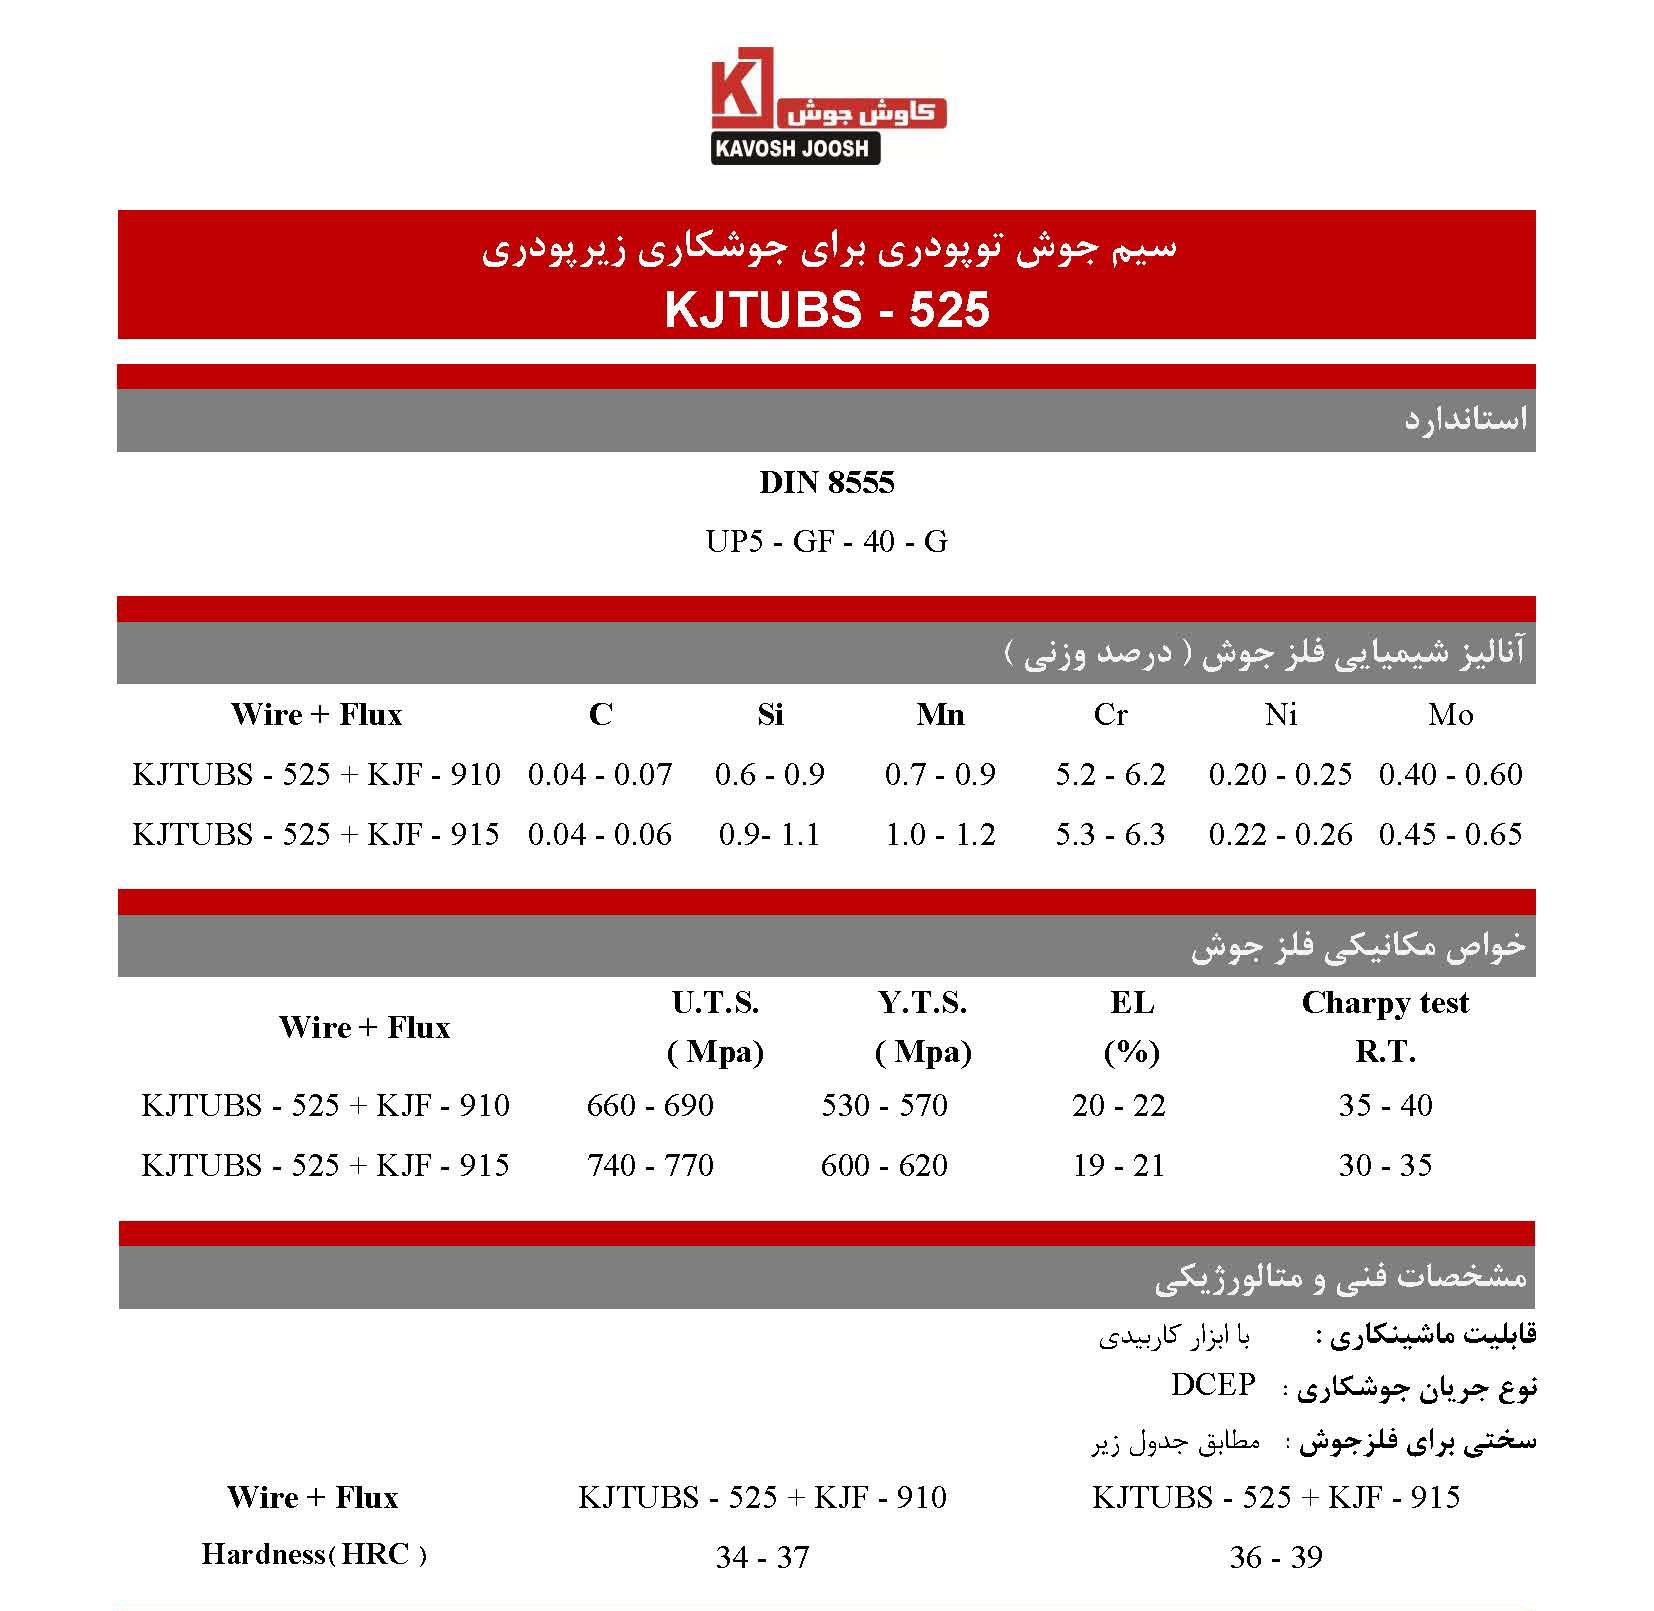 KJTUBS-525